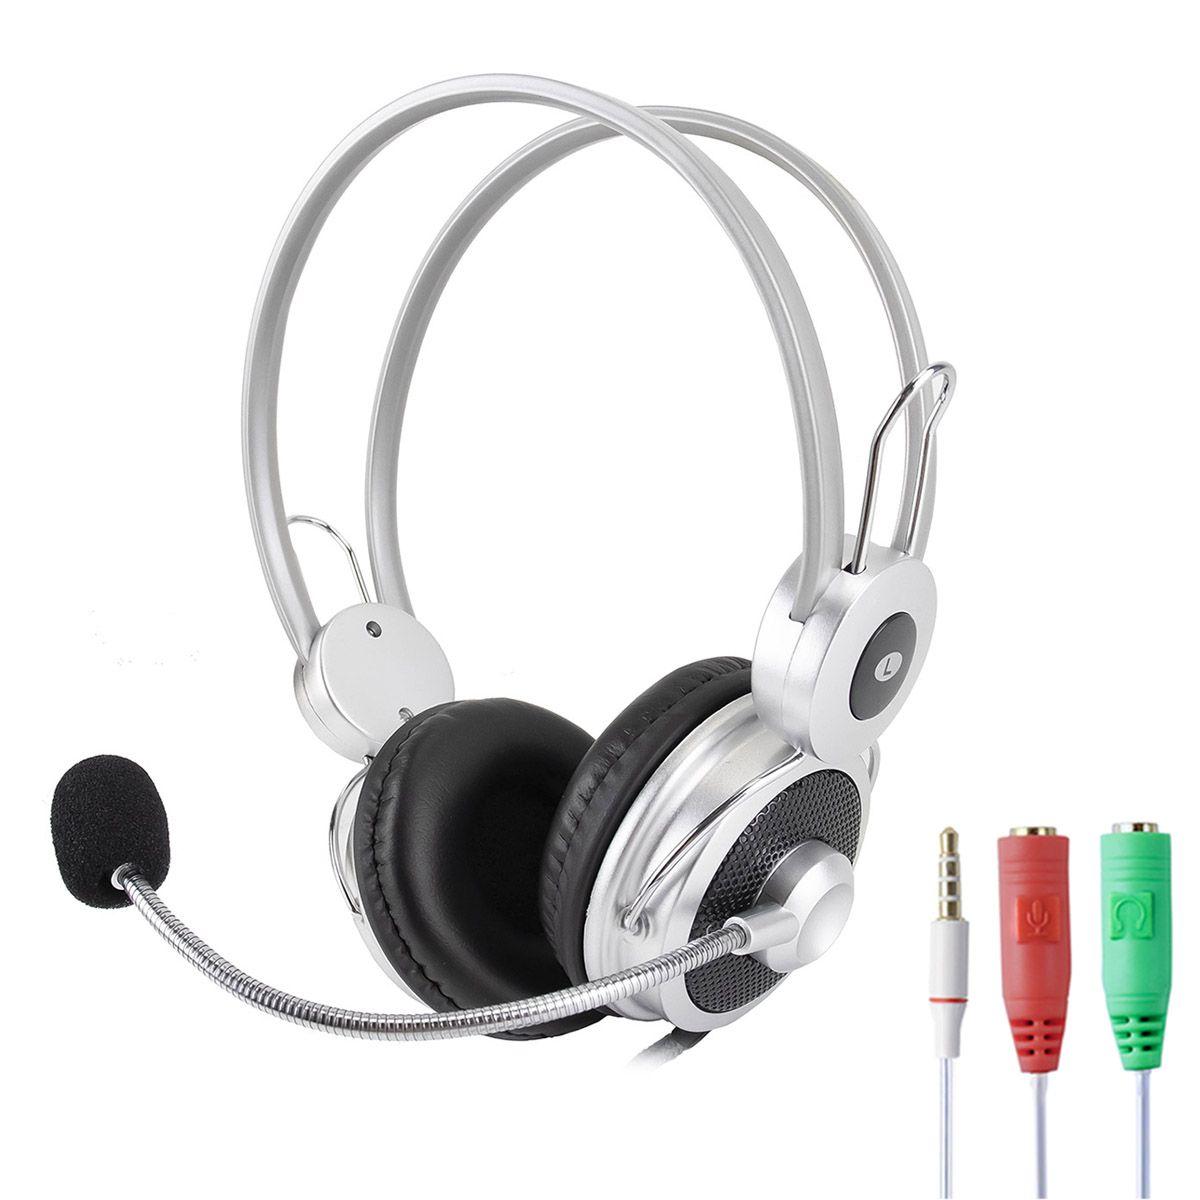 KIT Headset com Microfone Infokit HM-610MV + Adaptador P3 X P2